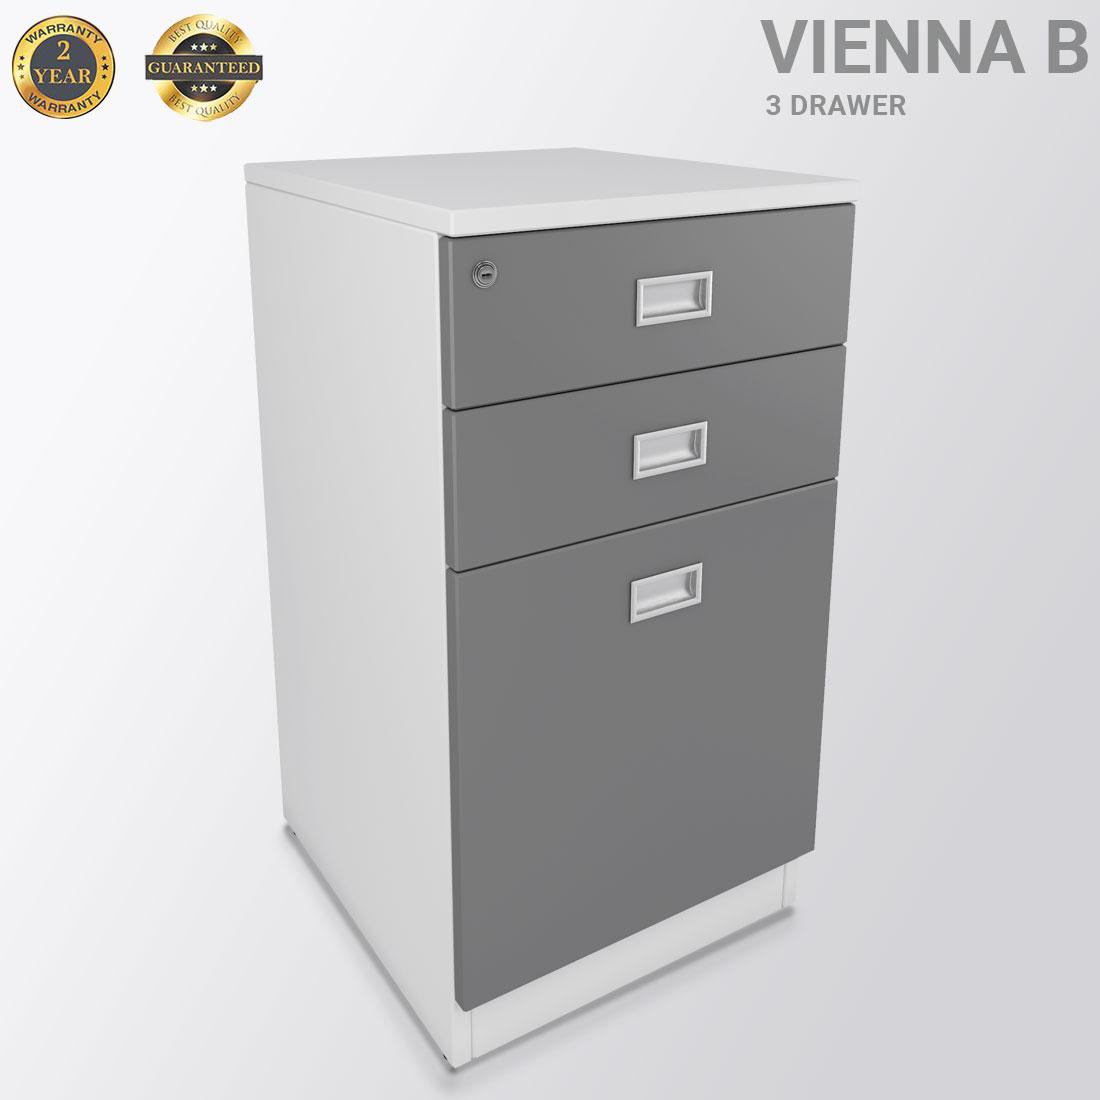 VIENNA B